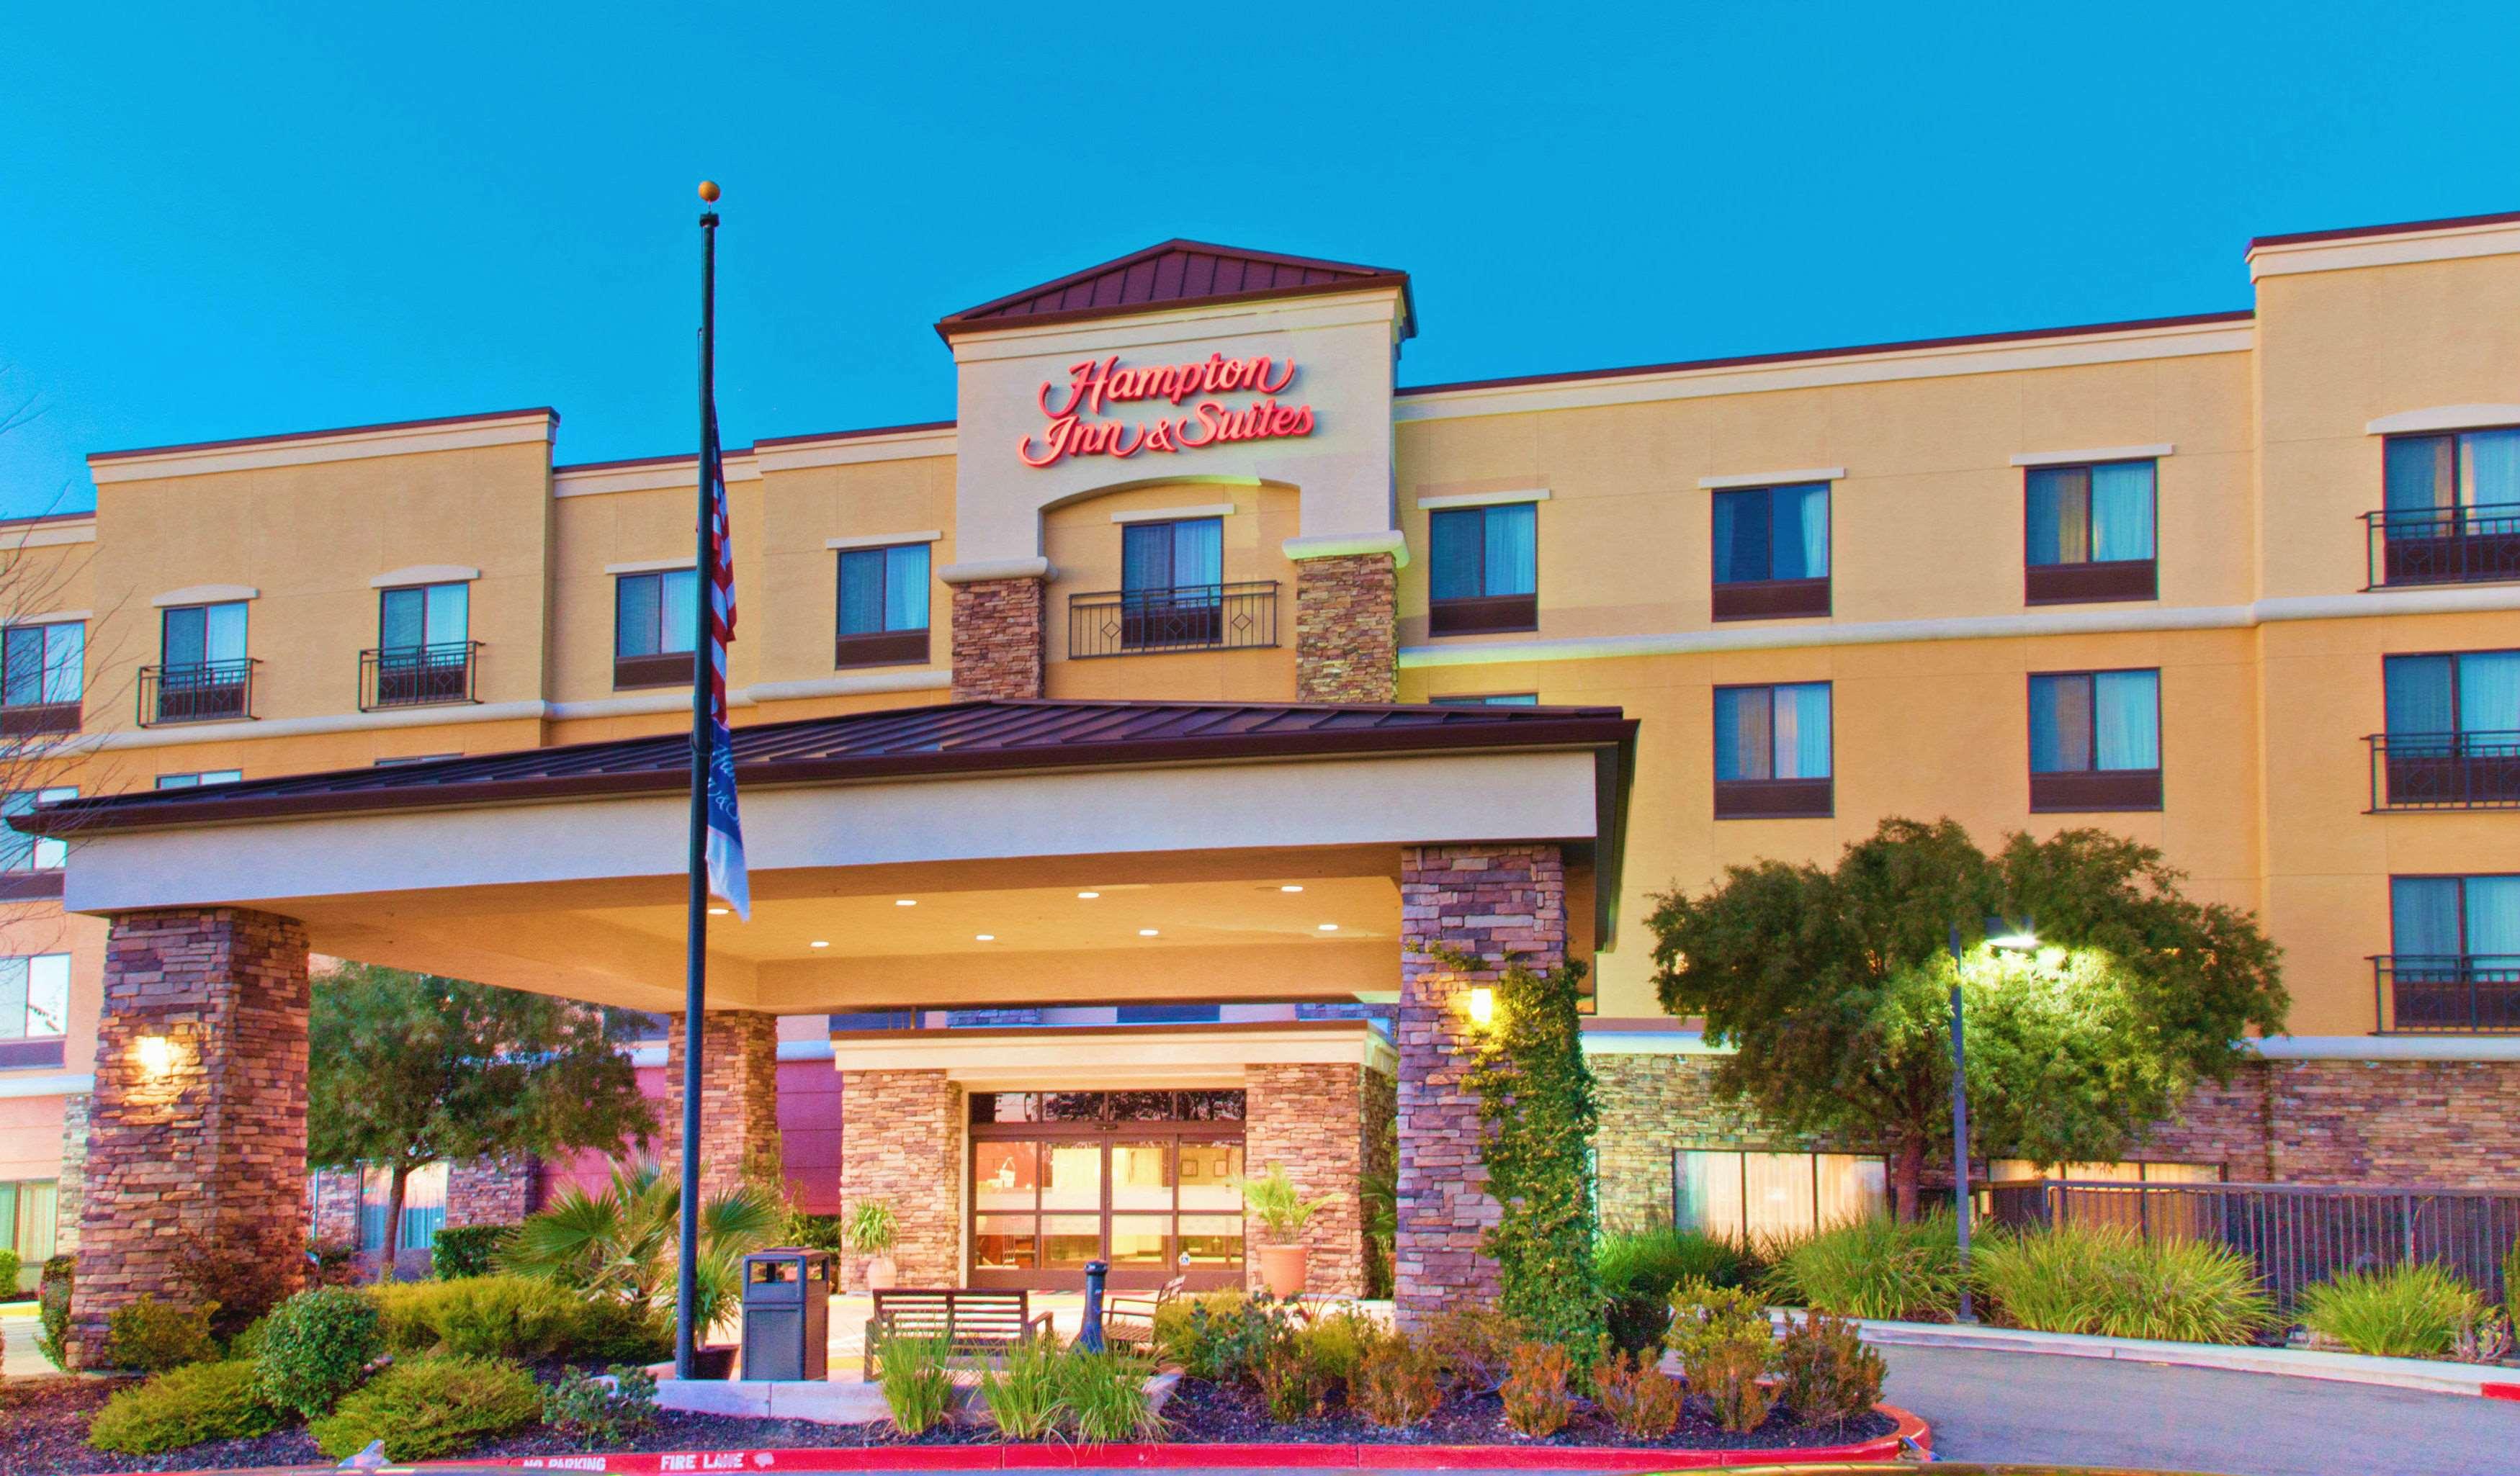 Hampton Inn & Suites Roseville image 0